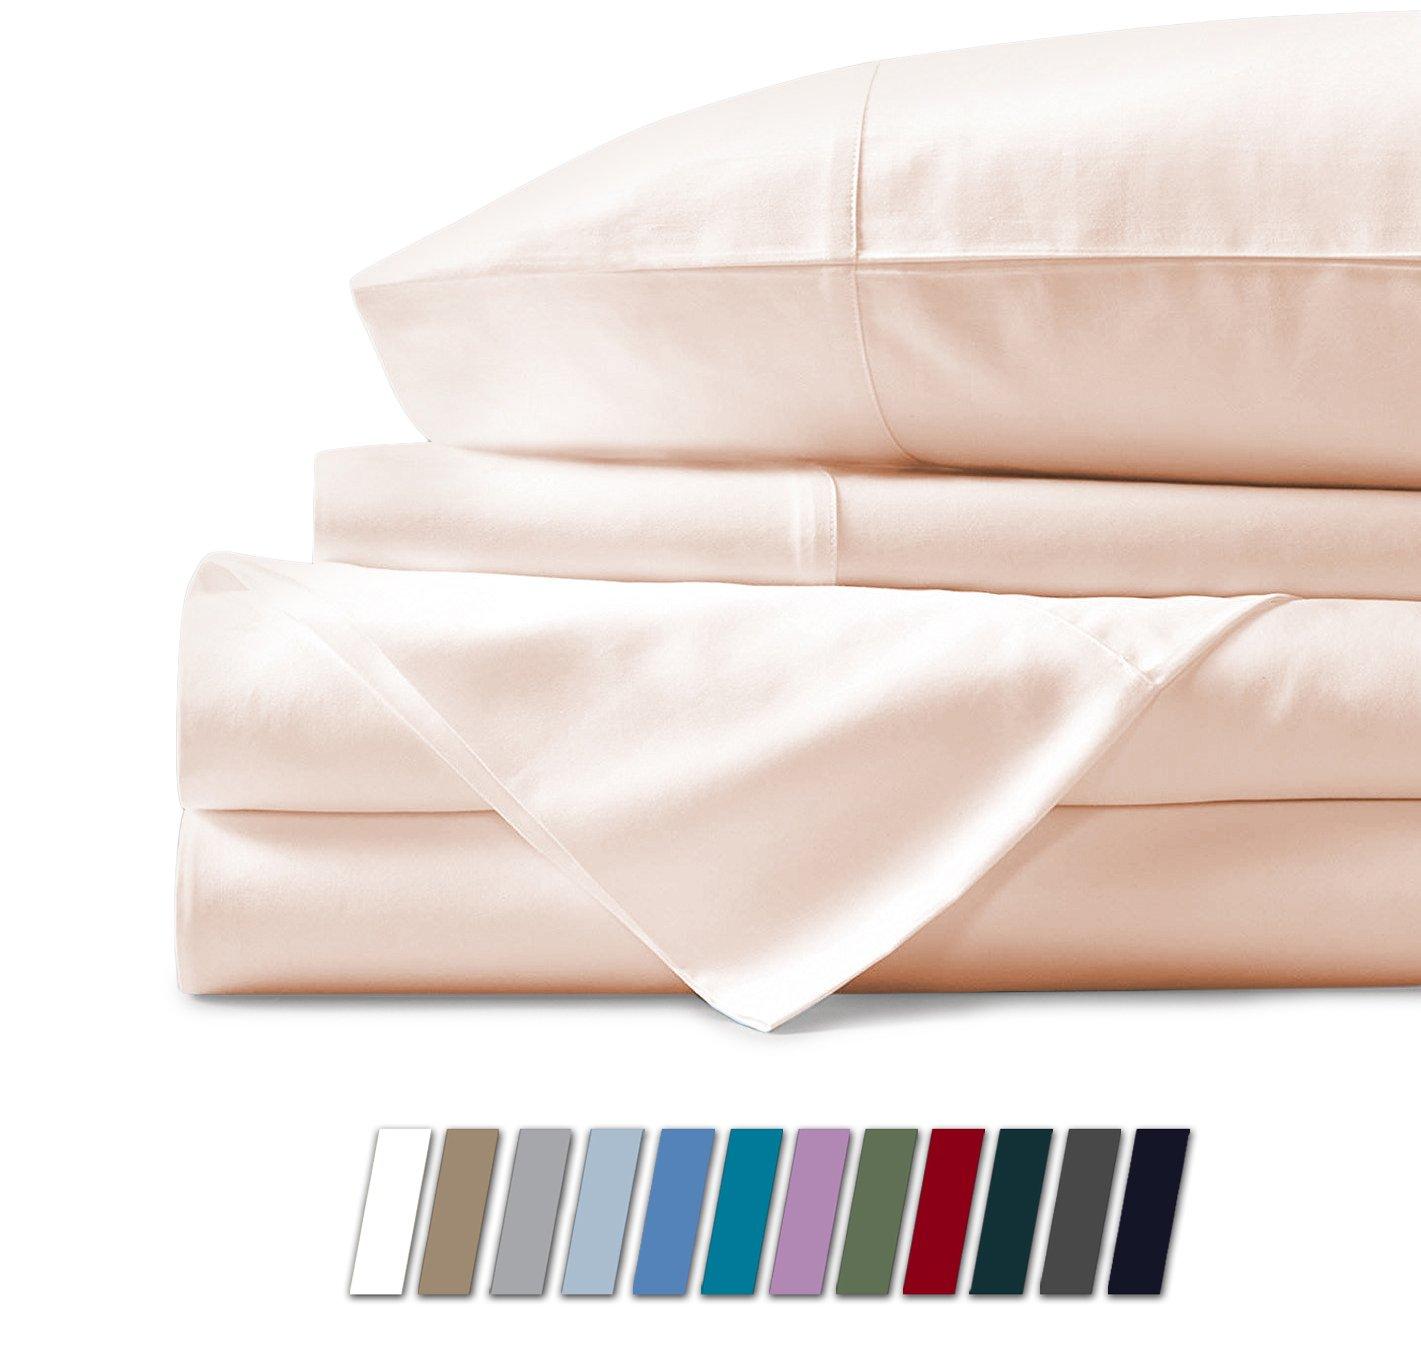 Mayfair Linen 100% Egyptian Cotton Sheets, Ivory